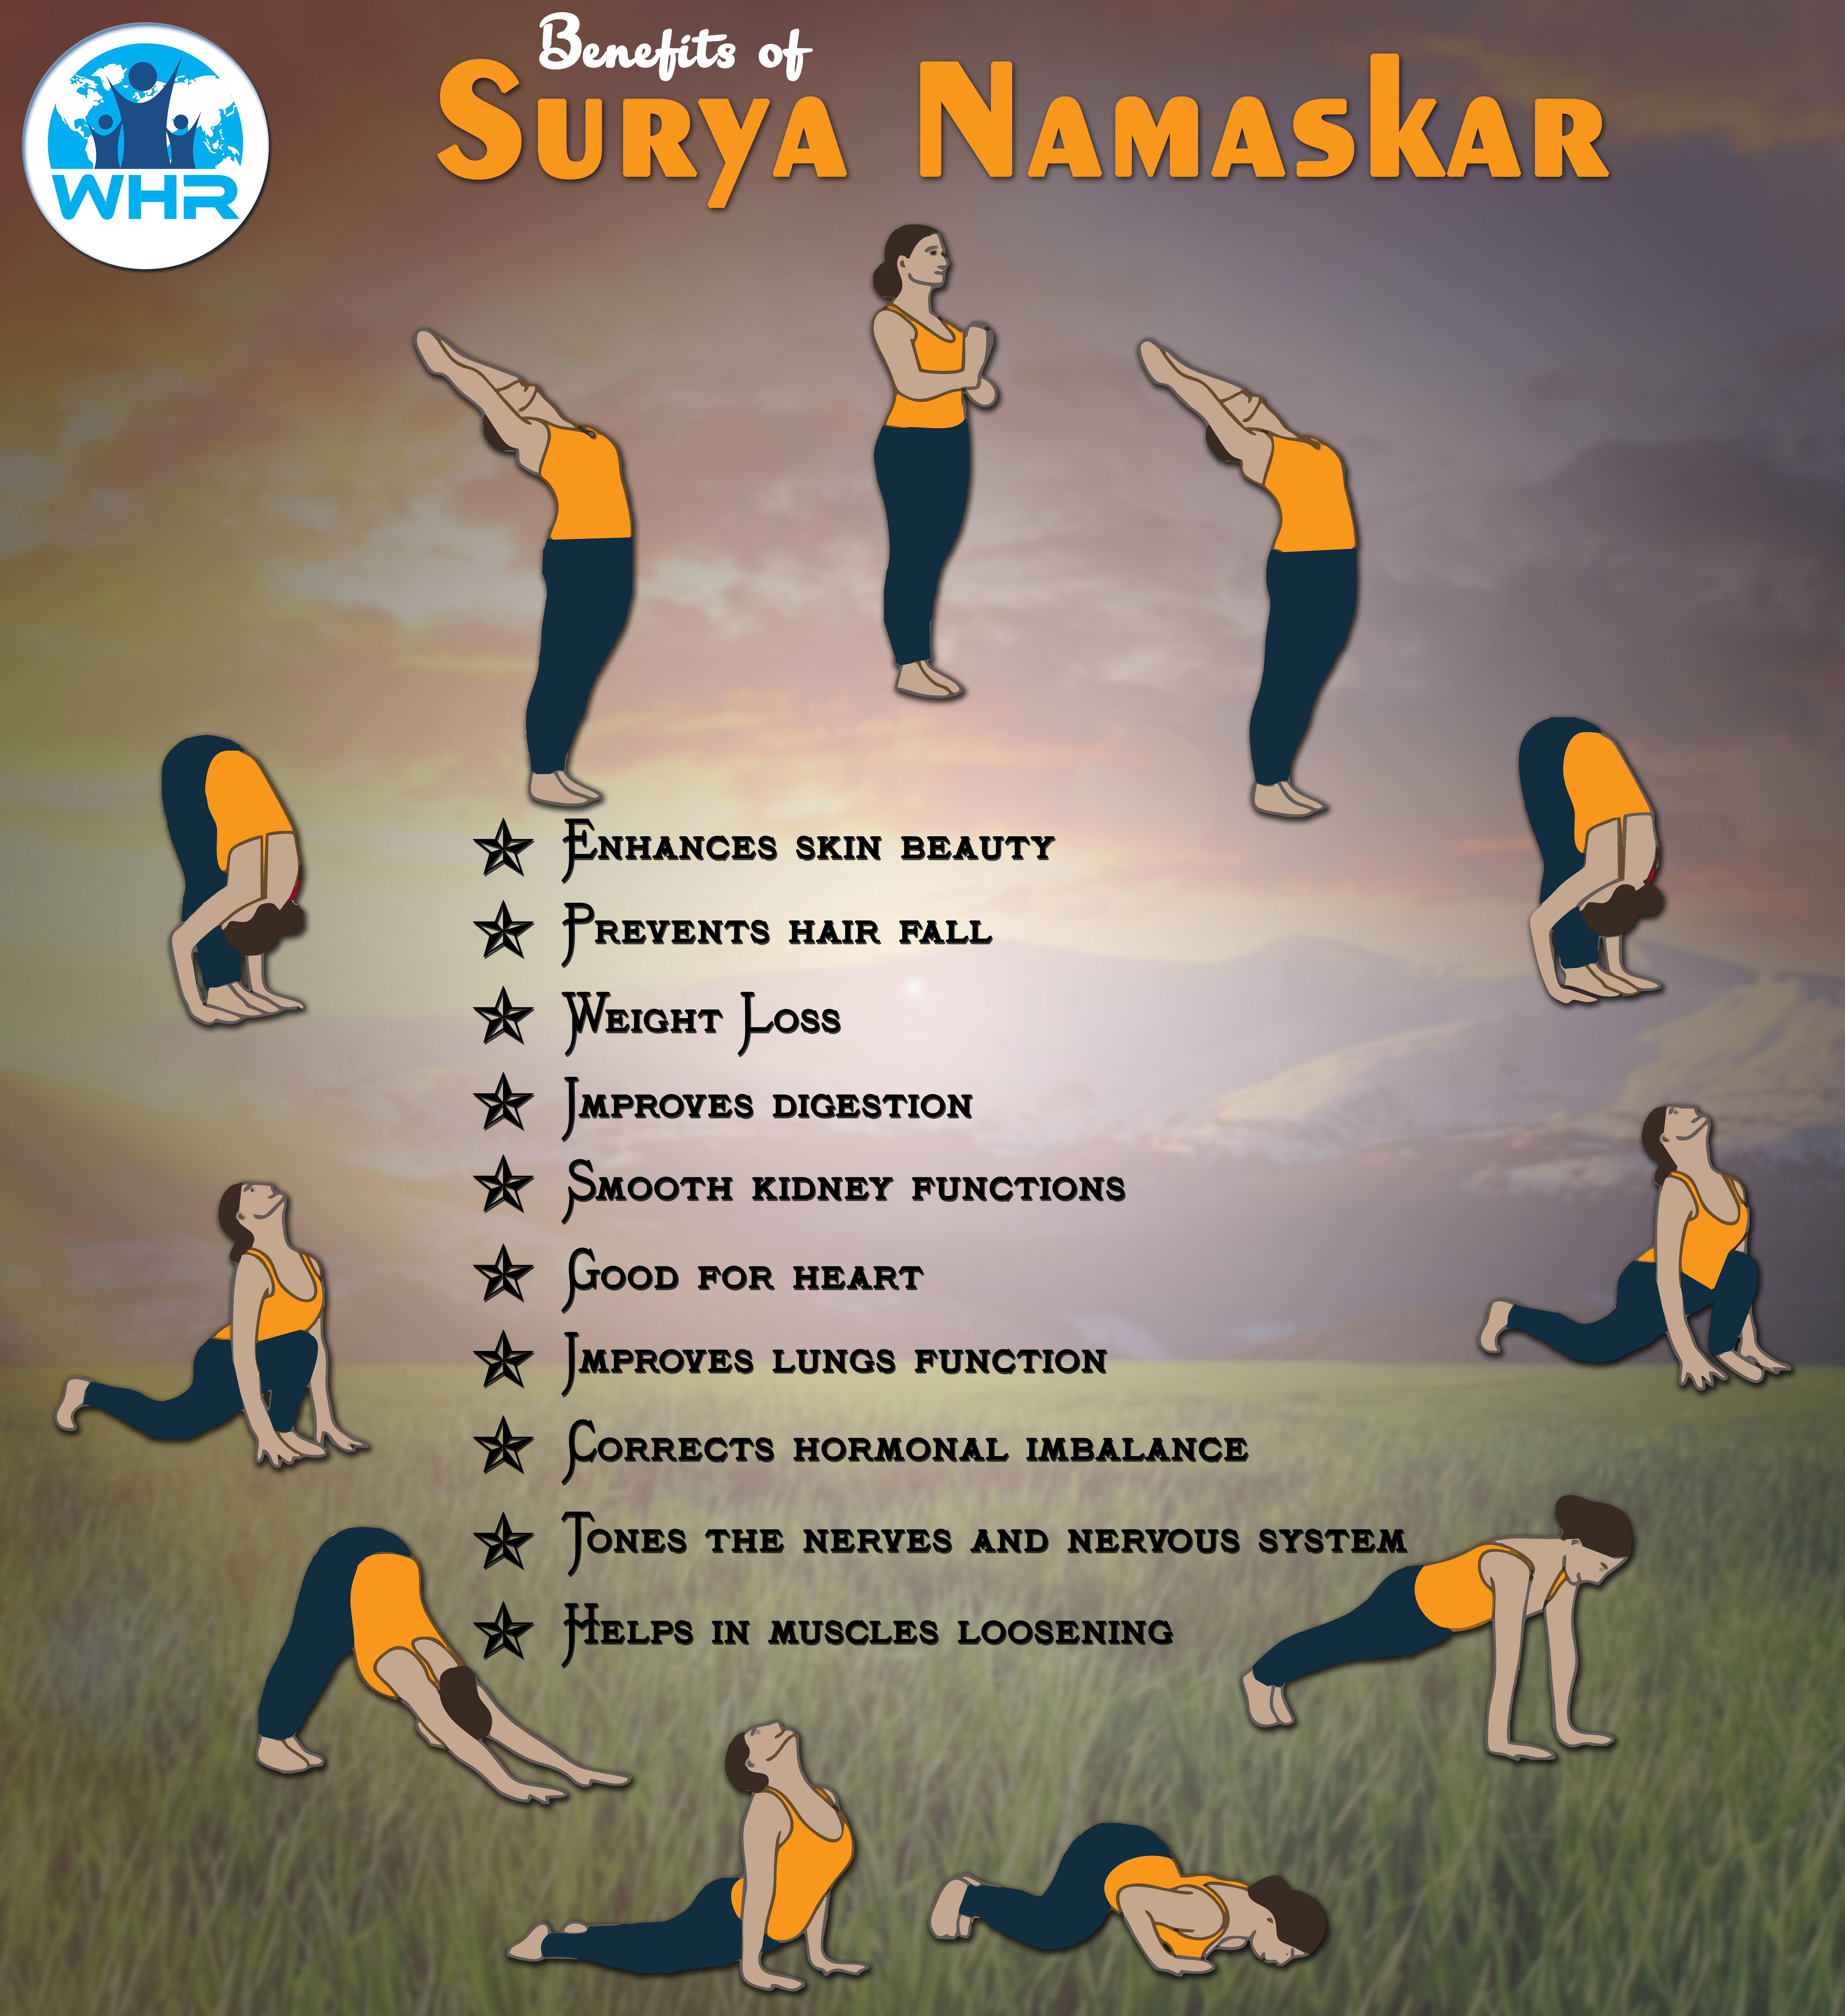 Surya Namaskar Yoga The Surya Namaskar And What Are Its Benefits Note Surya Namaskar Is Best Done Early M Book Hospital Doctor Visit Hospital Doctor